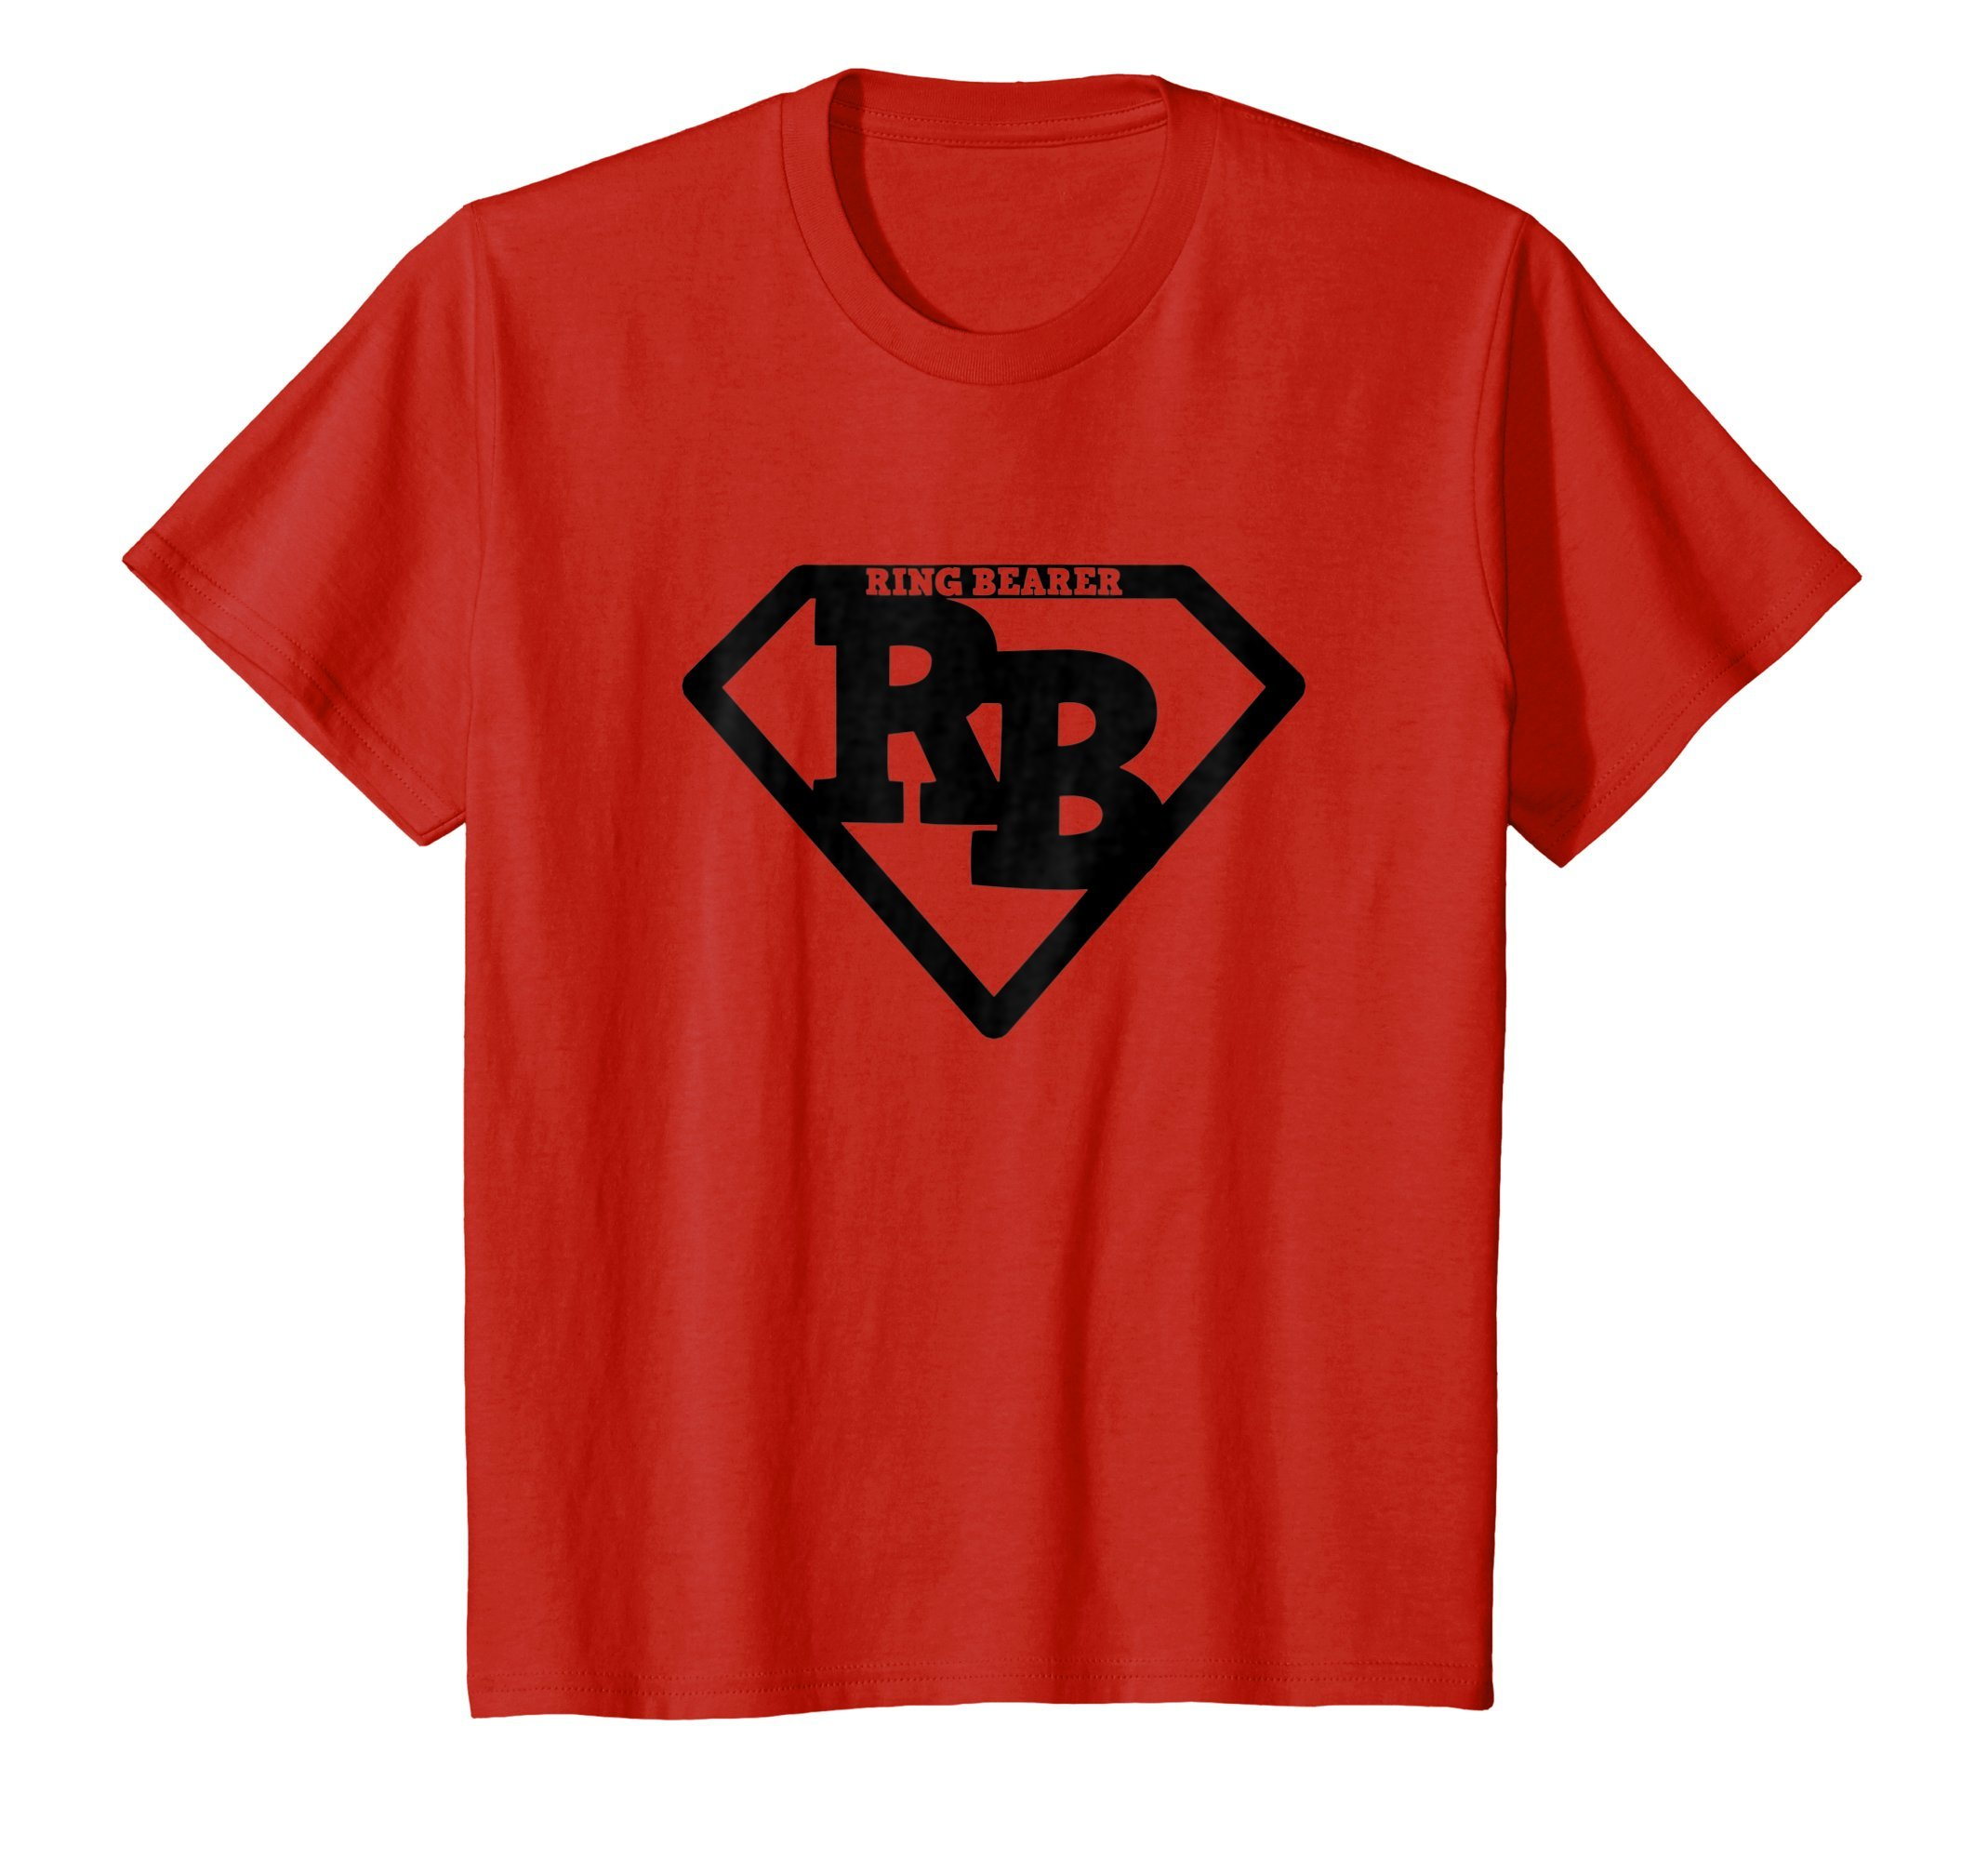 Kids Ring Bearer Super Cute Hero Shirt Black Logo Gift Tshirt 8 Red